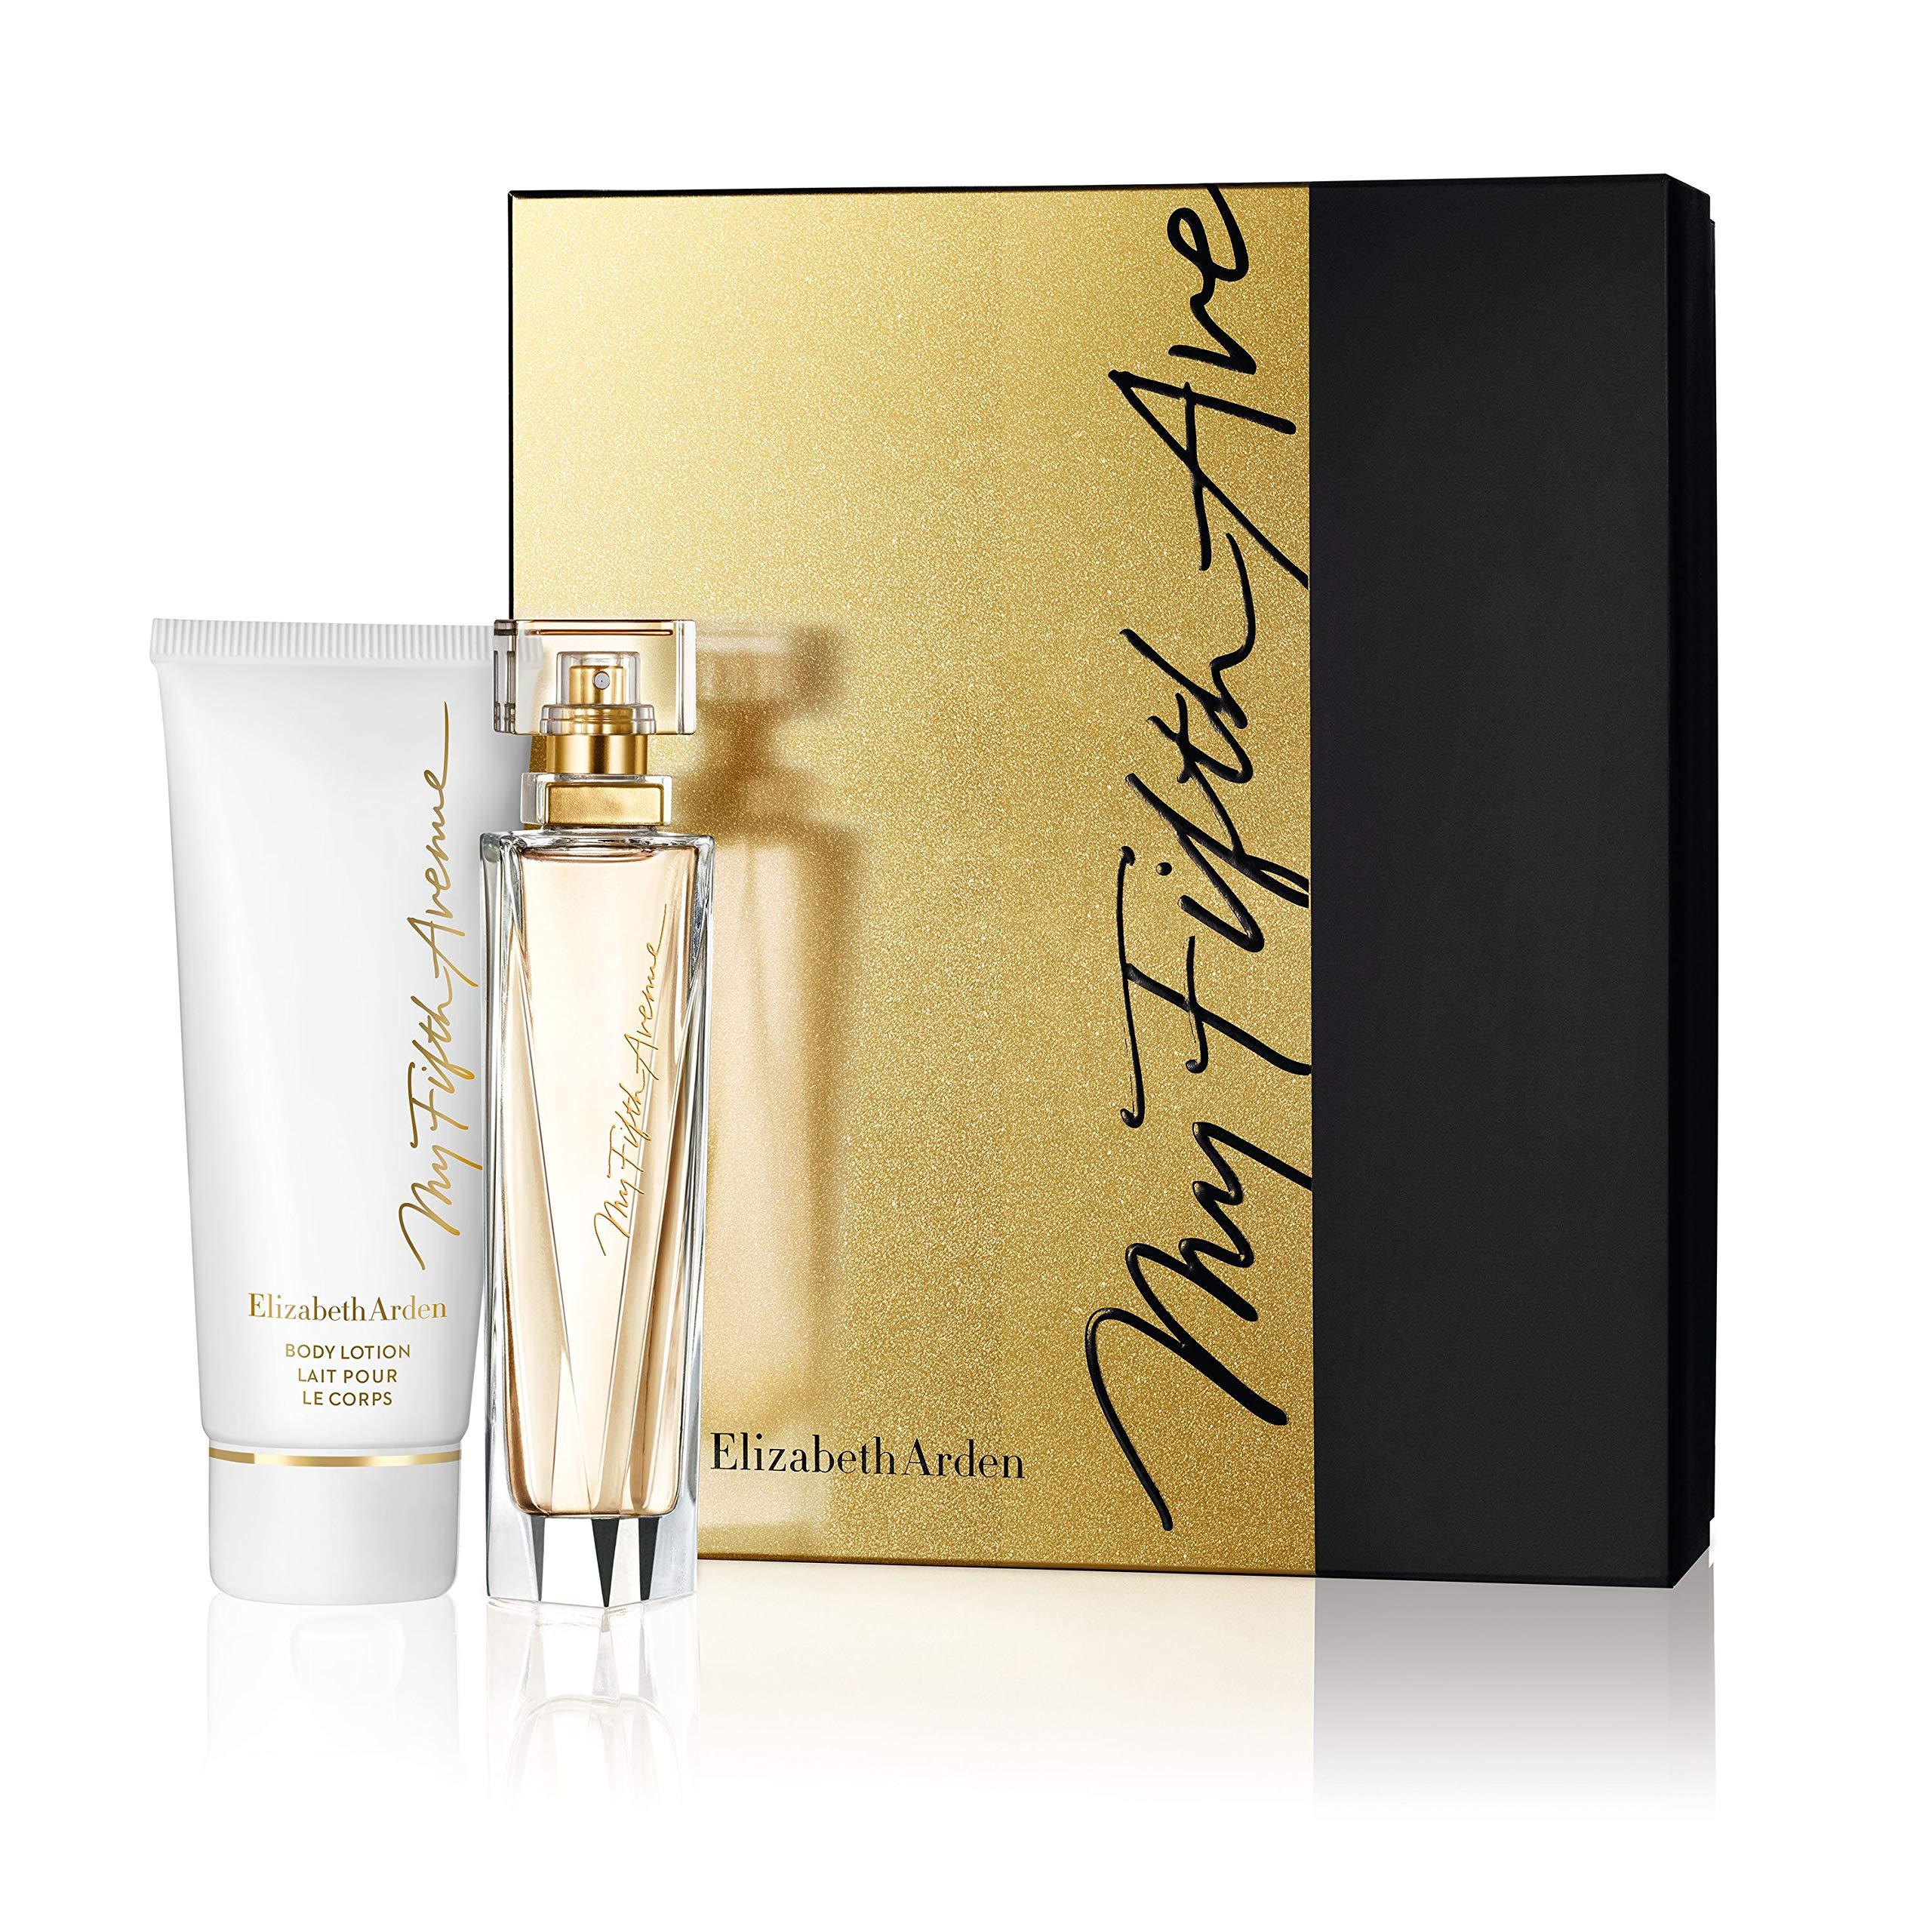 Elizabeth Arden My Fifth Avenue Eau De Parfum Spray 2 Piece Gift Set, 1.7 Oz.